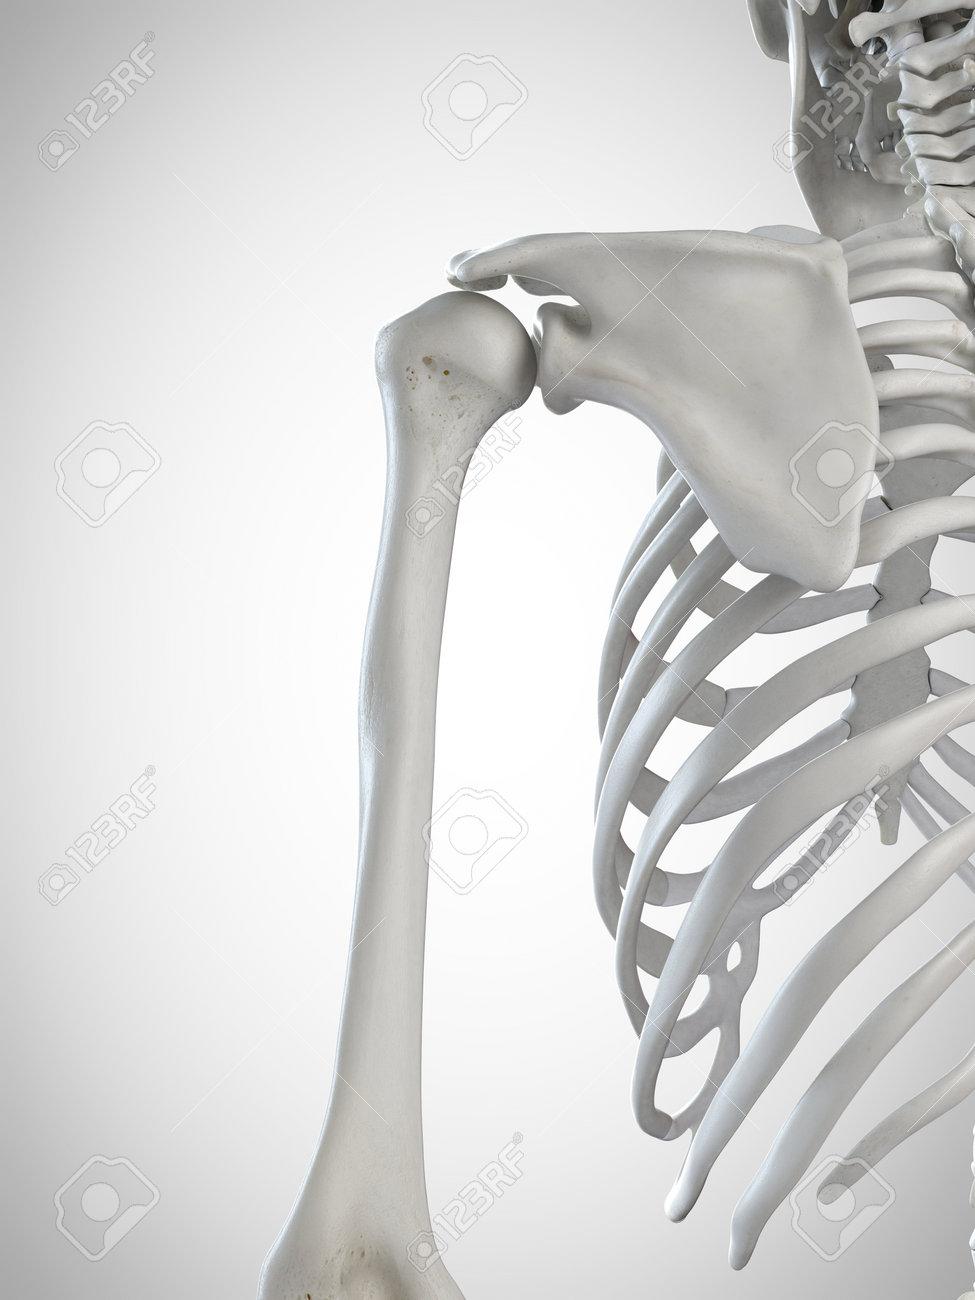 3d Rendered Medically Accurate Illustration Of The Shoulder Bones